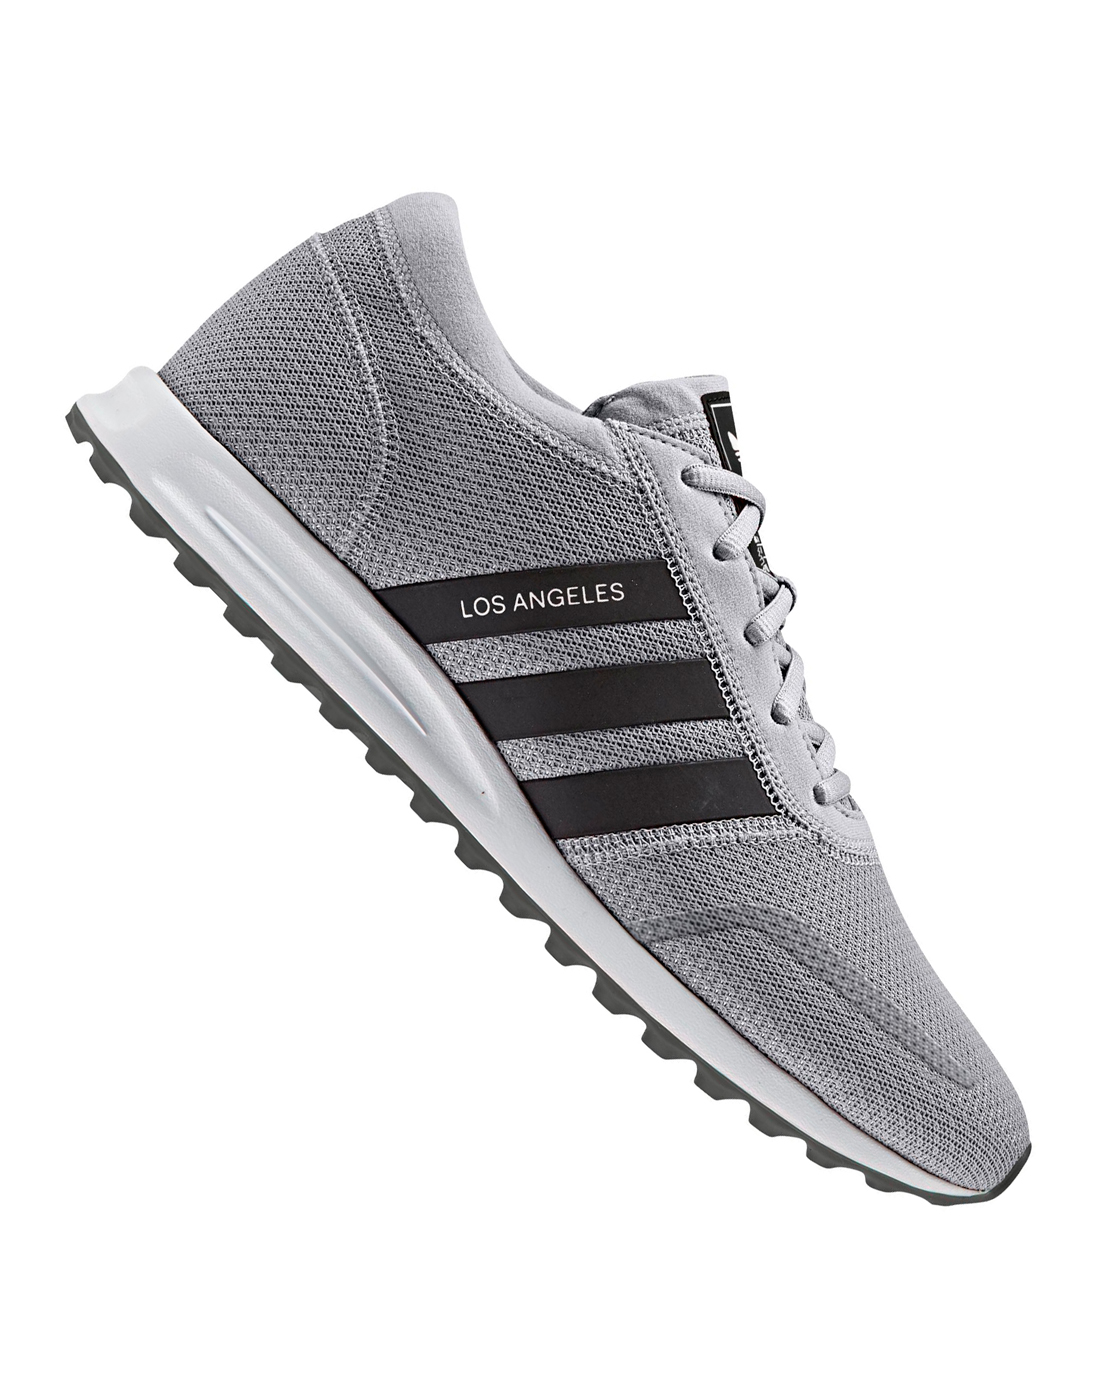 adidas Originals Mens Los Angeles | Grey | Life Style Sports